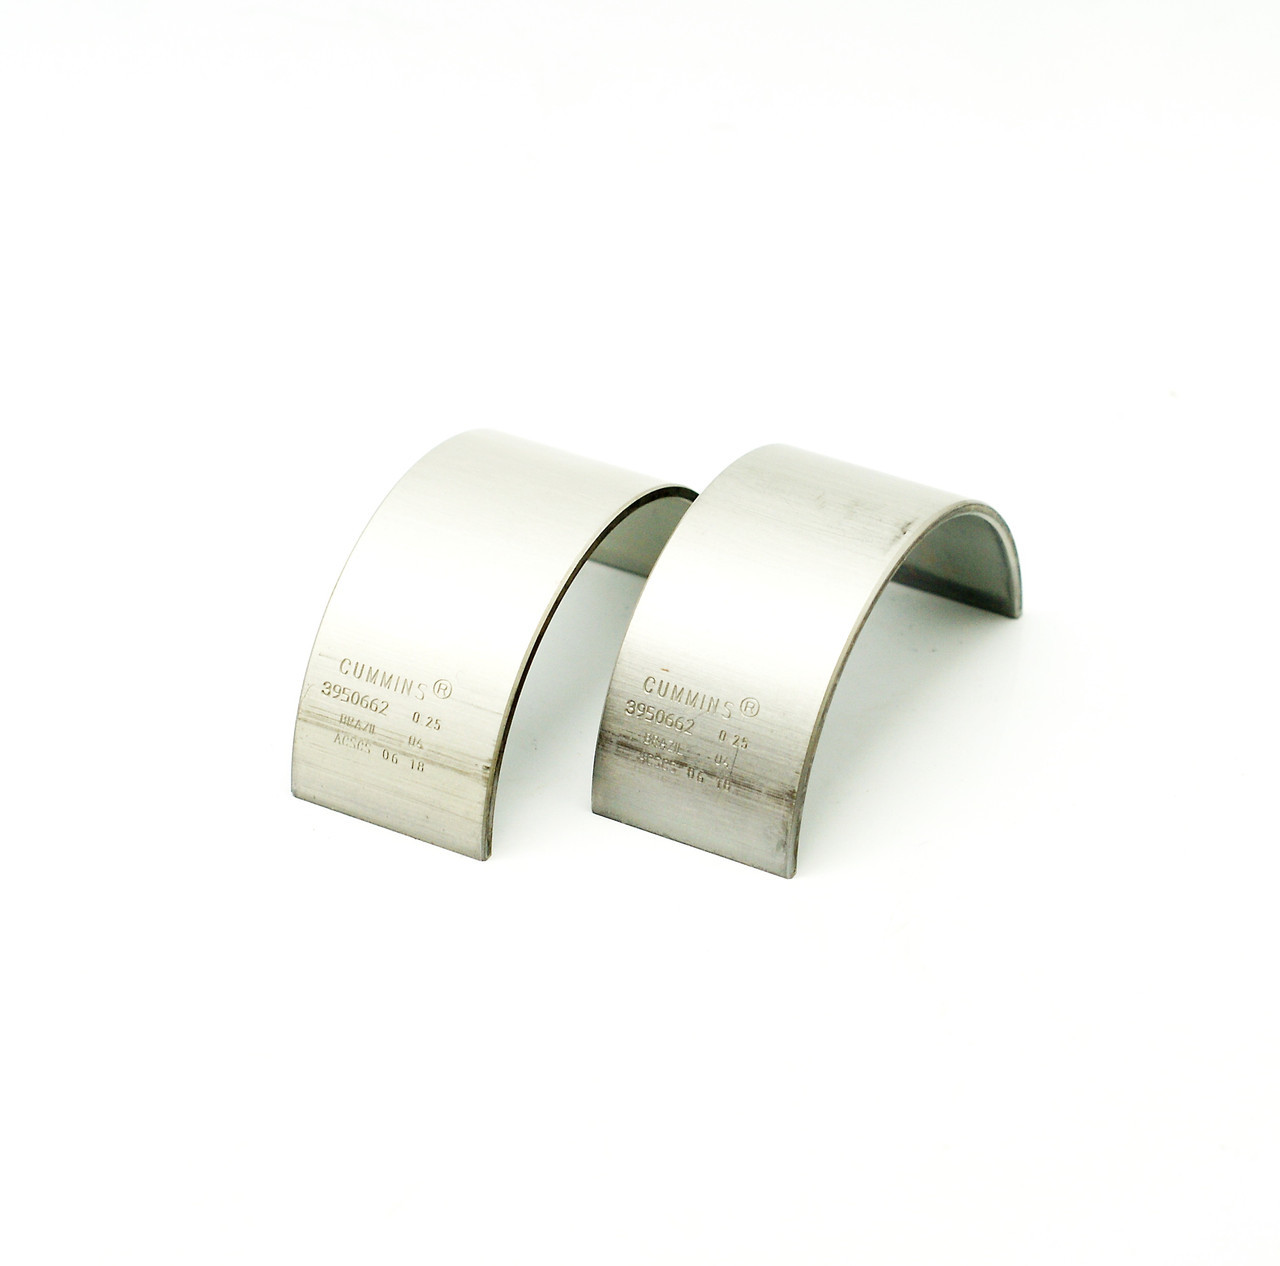 Шатунные вкладыши 1 р. р. (к-т на 1 шатун; +0,25) Cummins C Series 4352140